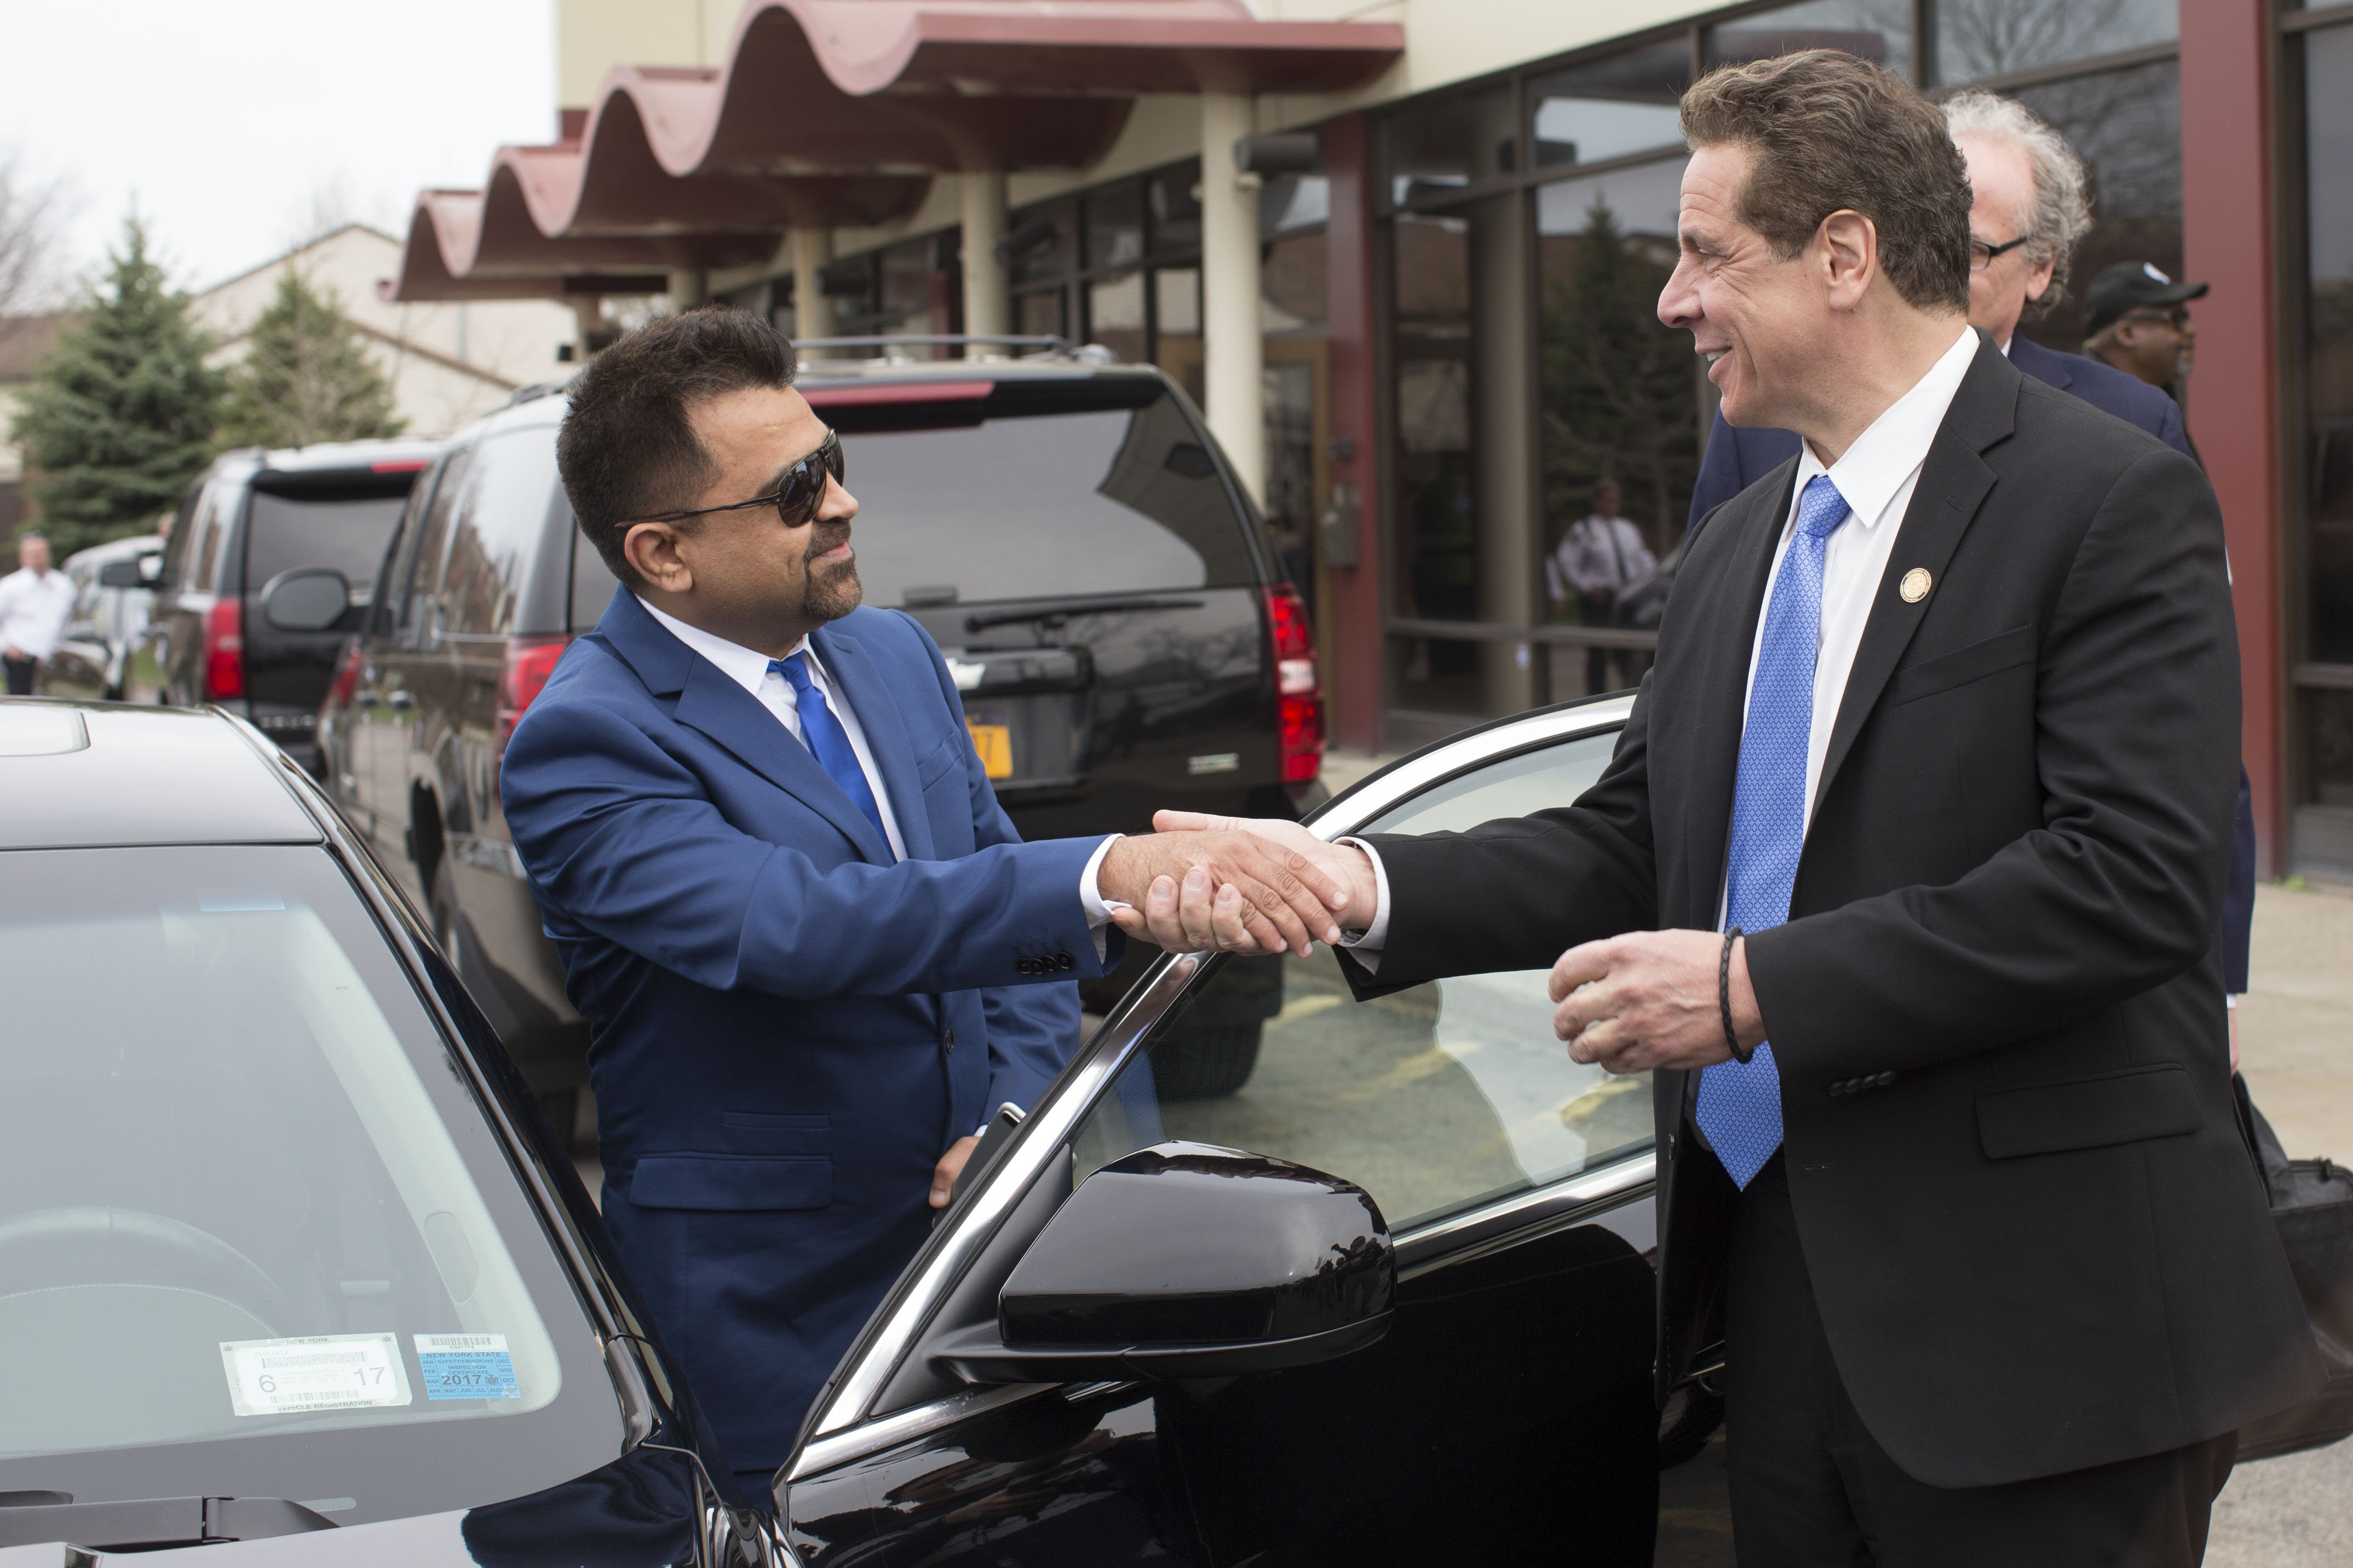 Gov. Cuomo thanks Uber driver Tariq Nawaz after Nawaz dropped him off at an event at the Rev. Smith Family Life Center, Tuesday, April 11, 2017. (Derek Gee/Buffalo News)